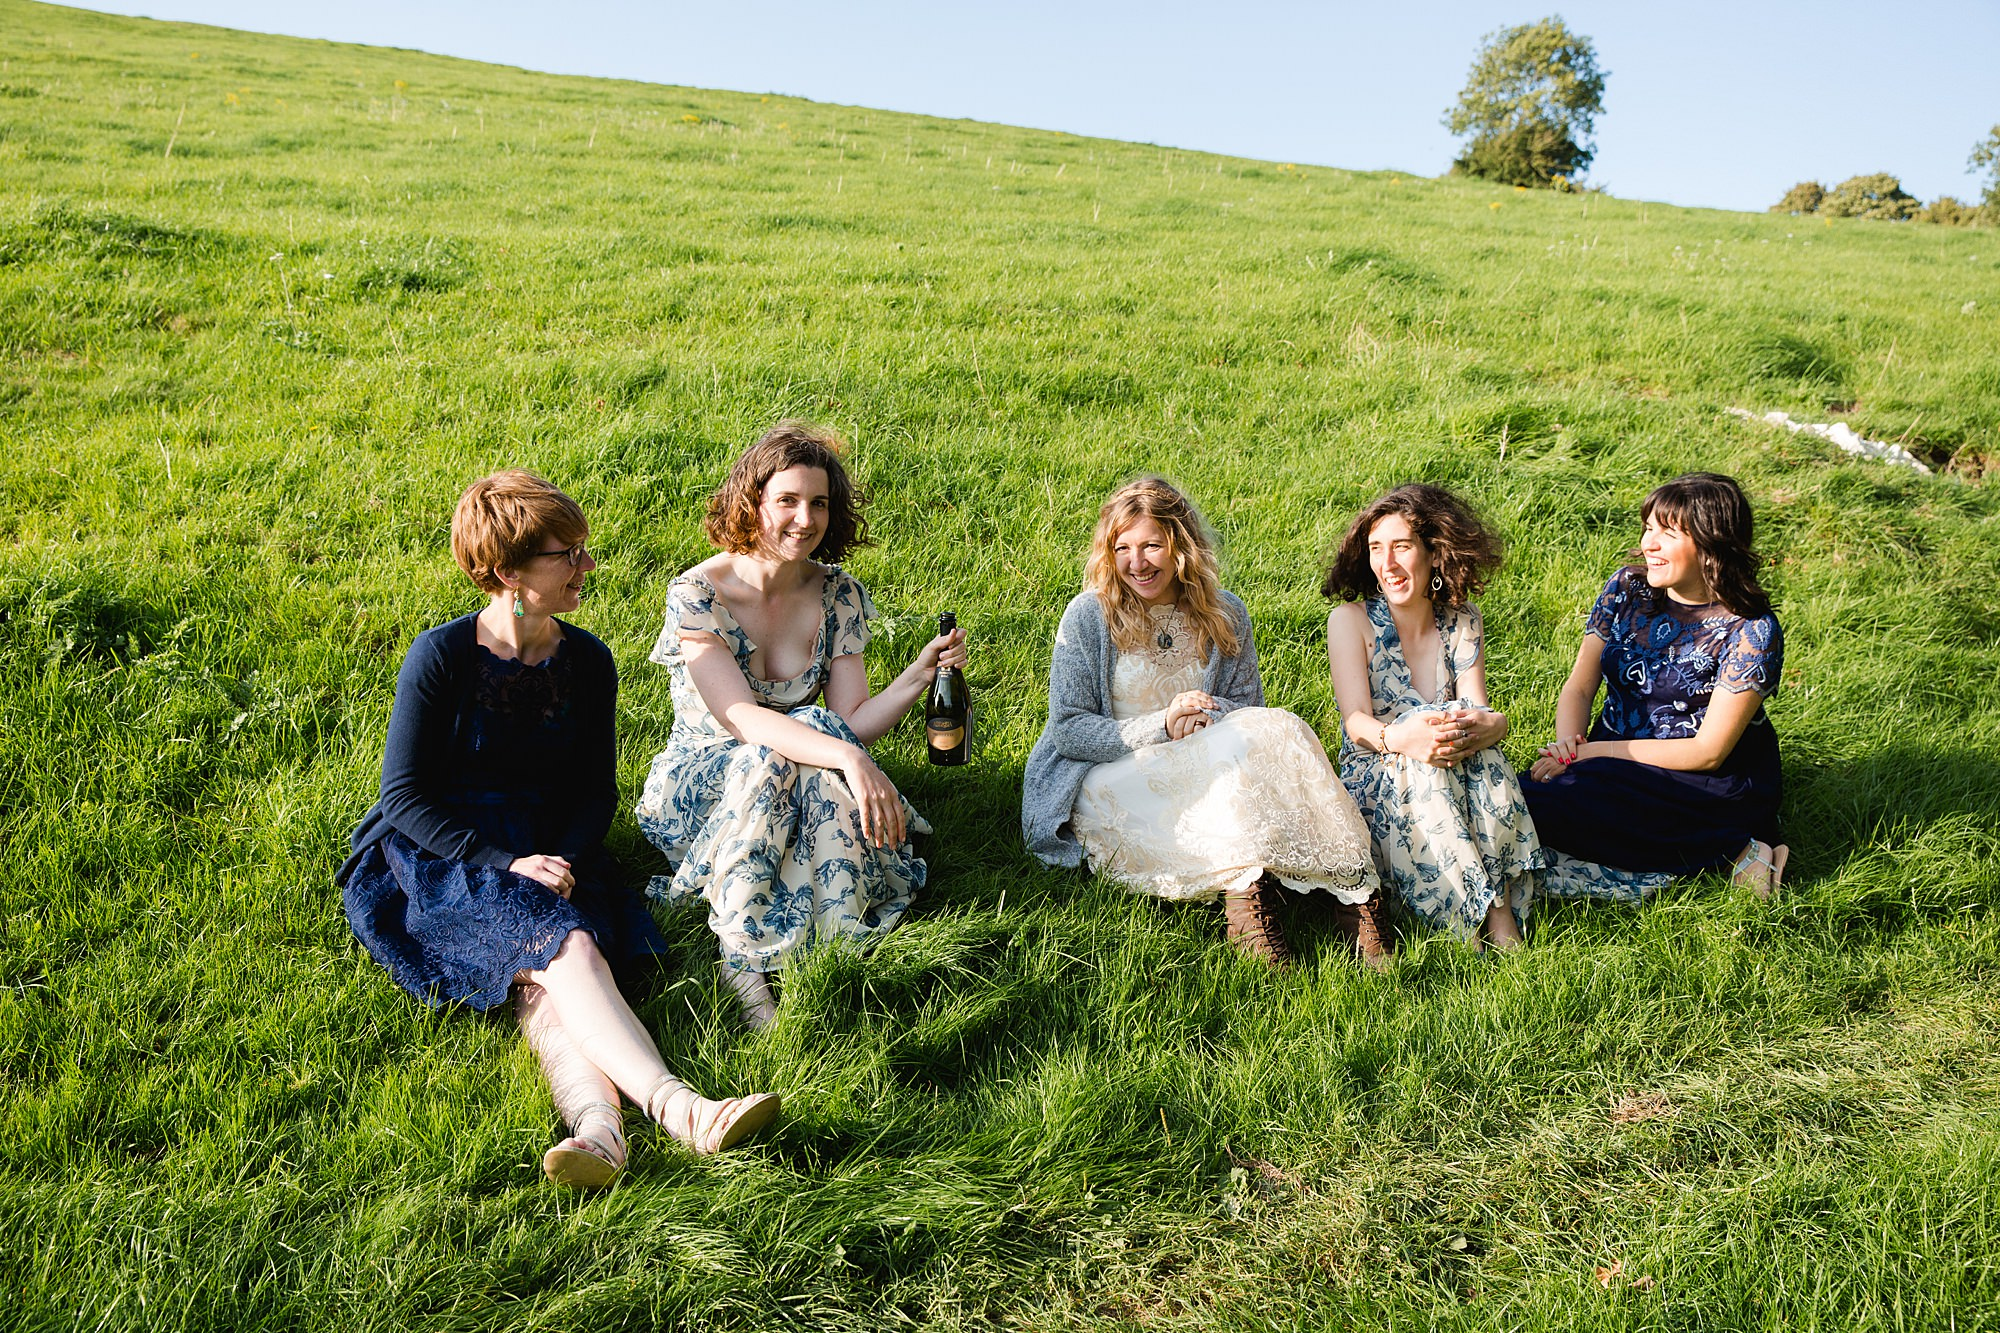 Fun village hall wedding bride and bridesmaids sit on grass together